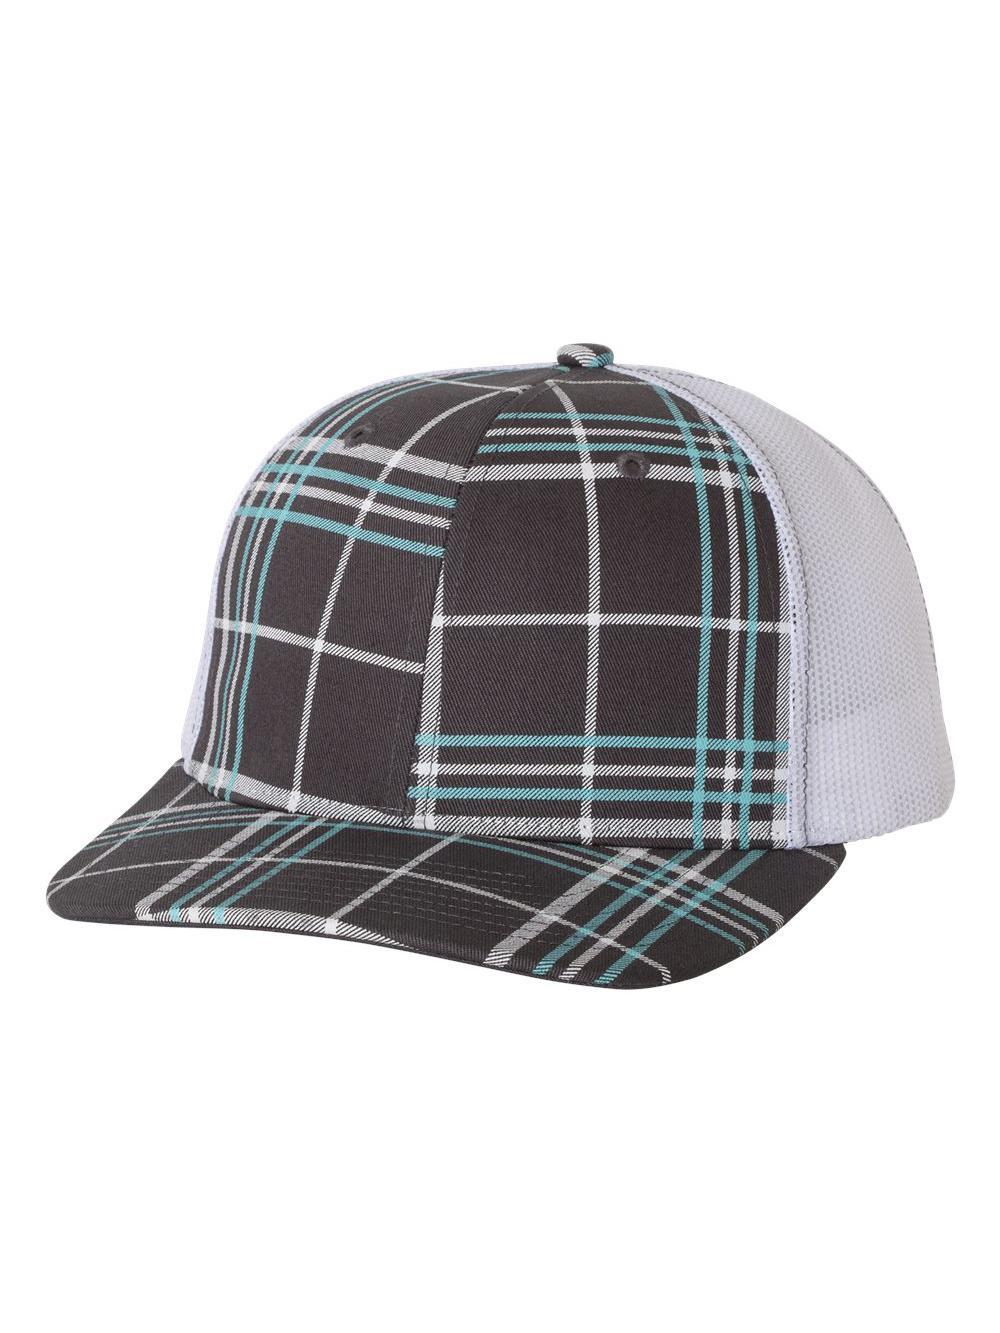 50 Richardson Trucker Patterned Snapback Cap 112p Baseball Hat ... c37cf8796ed